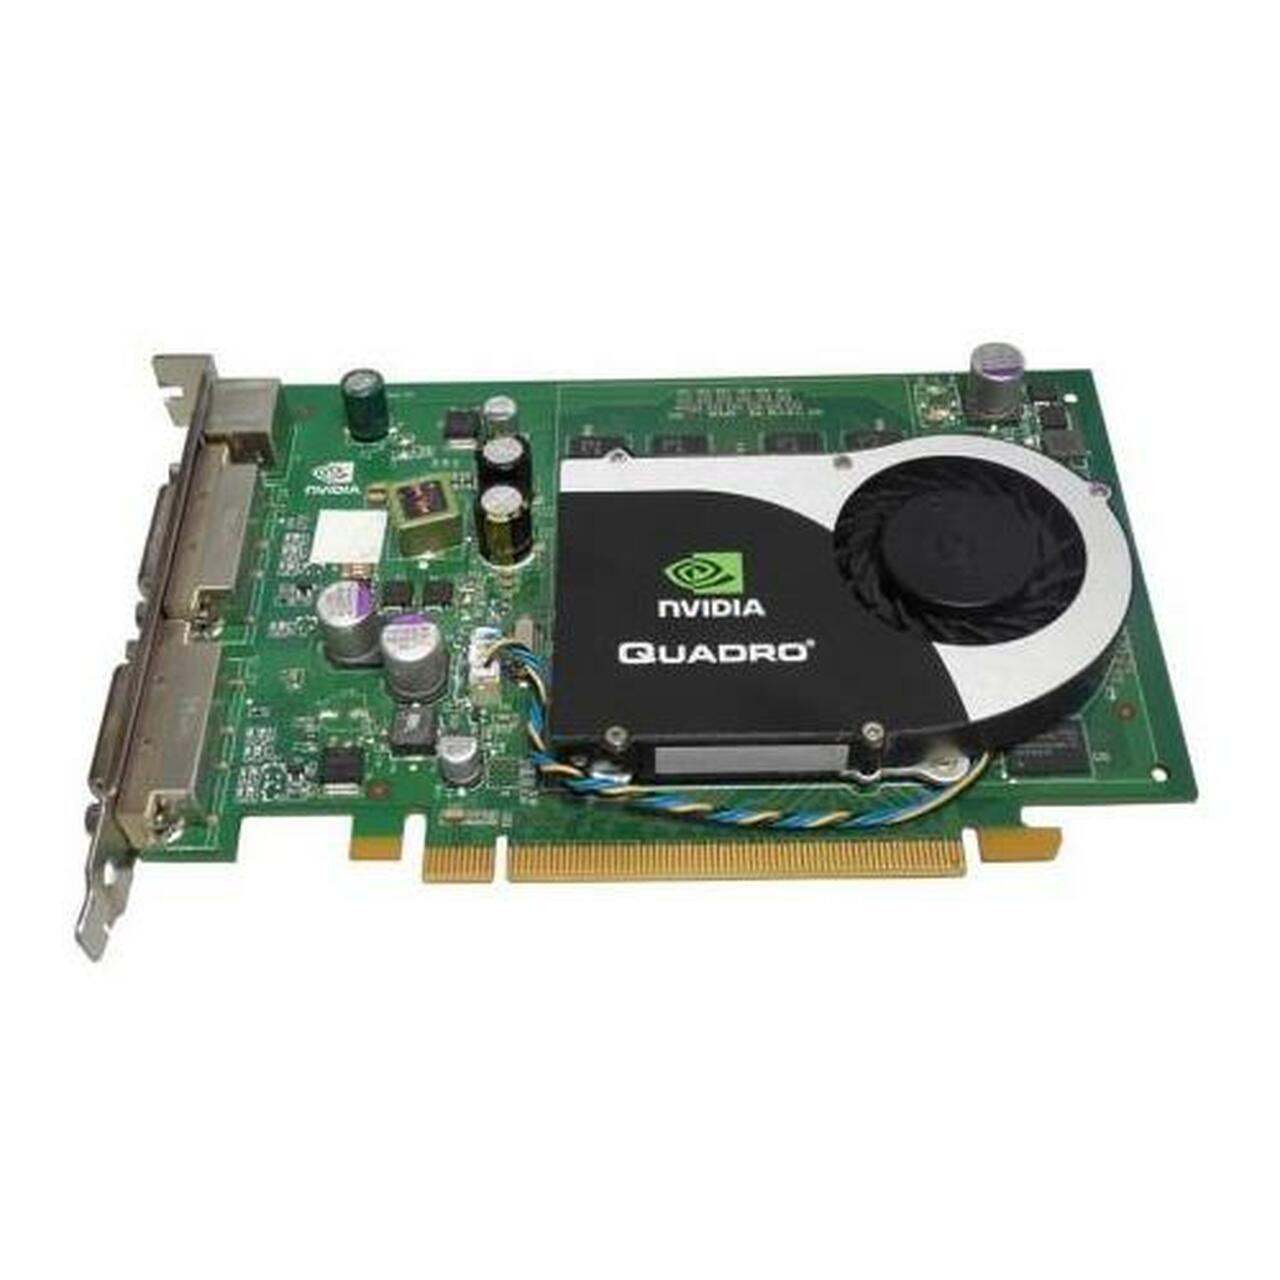 nVidia Quadro FX1700 512MB dual DVI Graphics Card, Dell Precision 320-5868